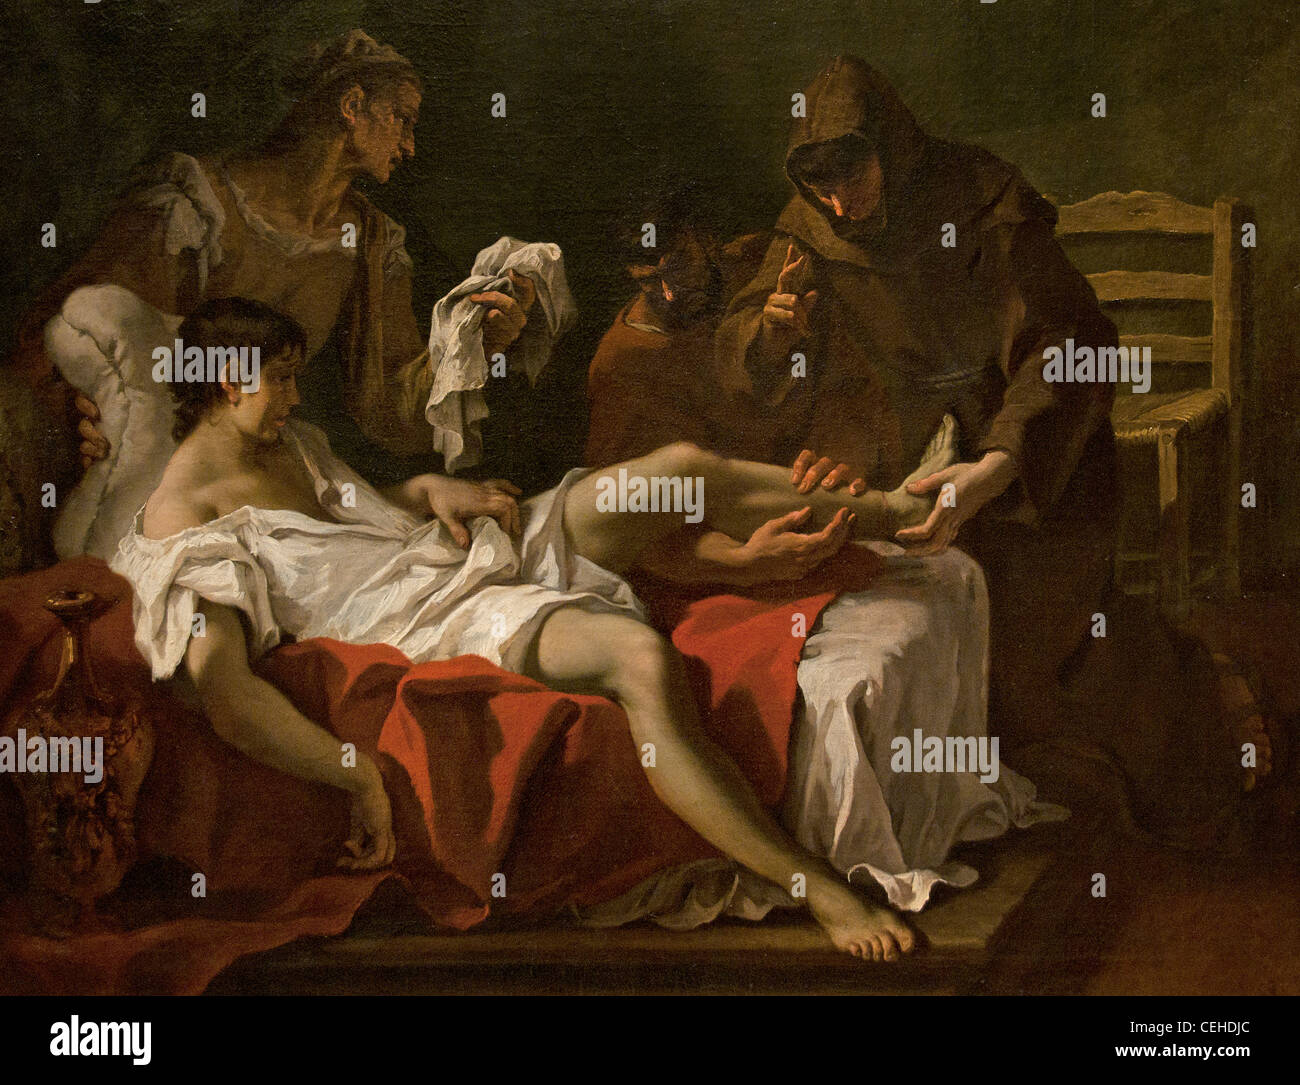 Saint of Padua healing a young man who had his foot amputated  1690 Anthony Sebastiano Ricci Antoine 1659-1734 Italy Stock Photo